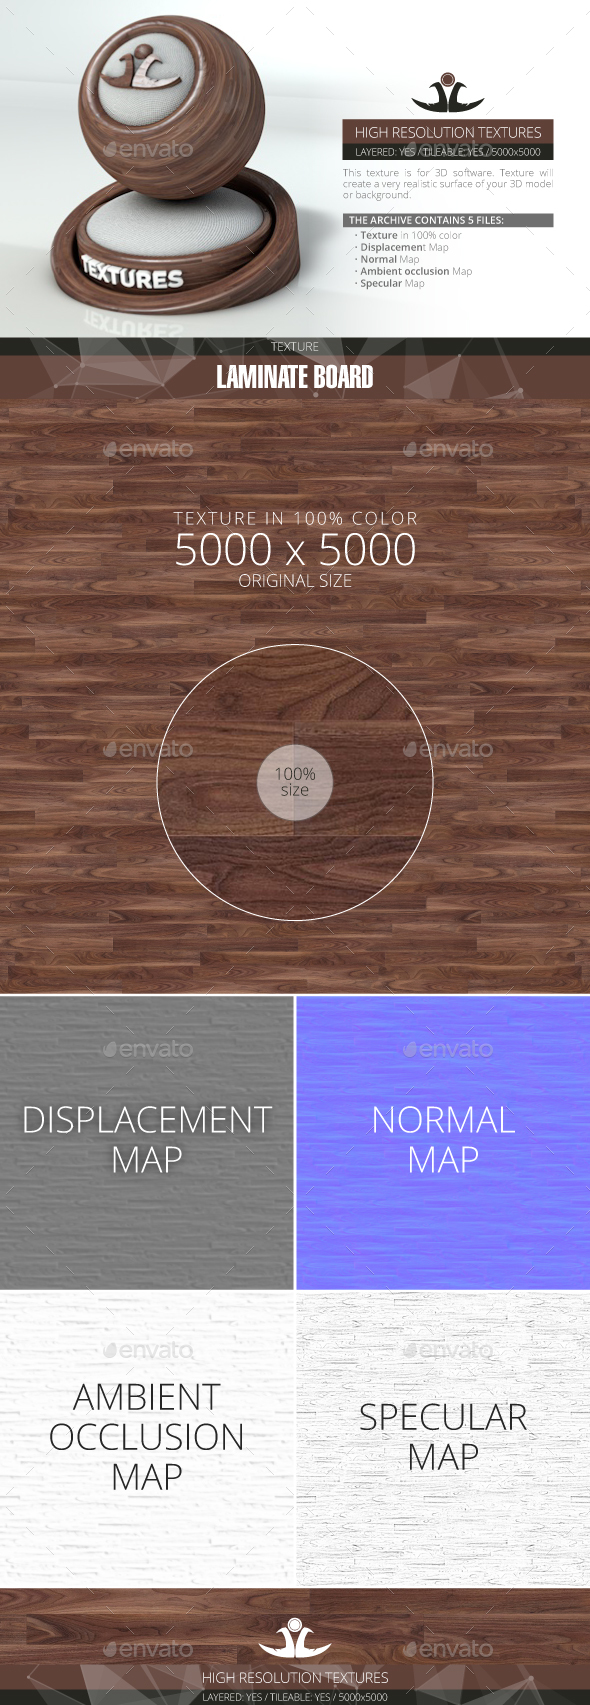 Laminate Board 70 - 3DOcean Item for Sale